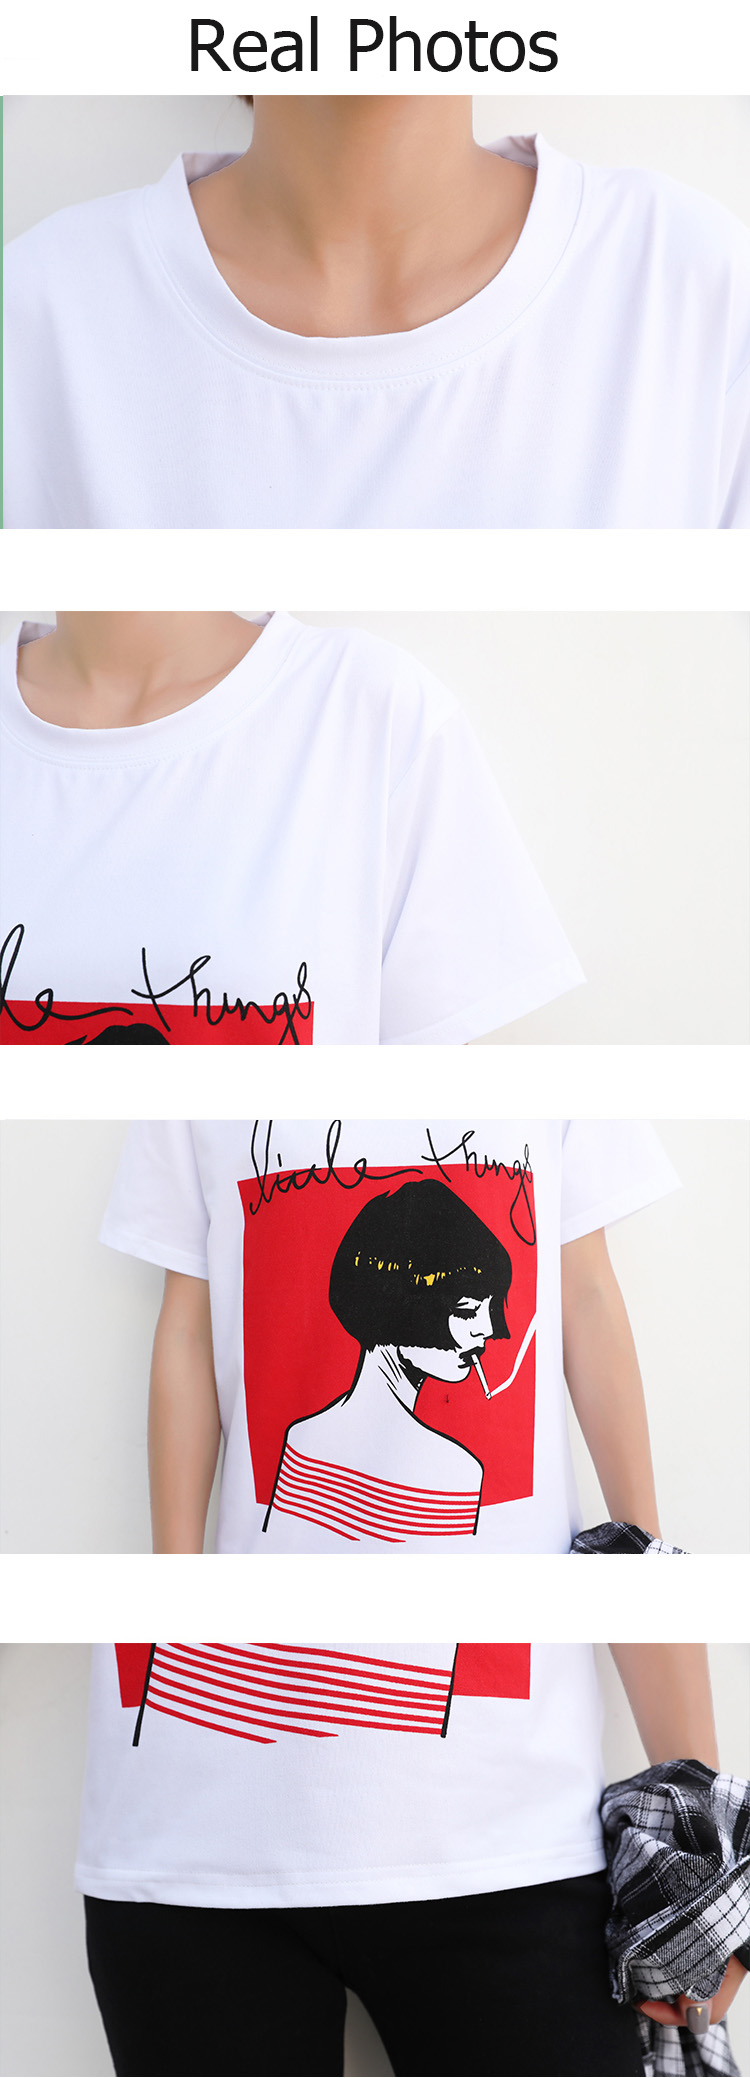 HTB1PqCzQFXXXXb0XXXXq6xXFXXXS - New Design 13 Styles Women Casual White T Shirt Female